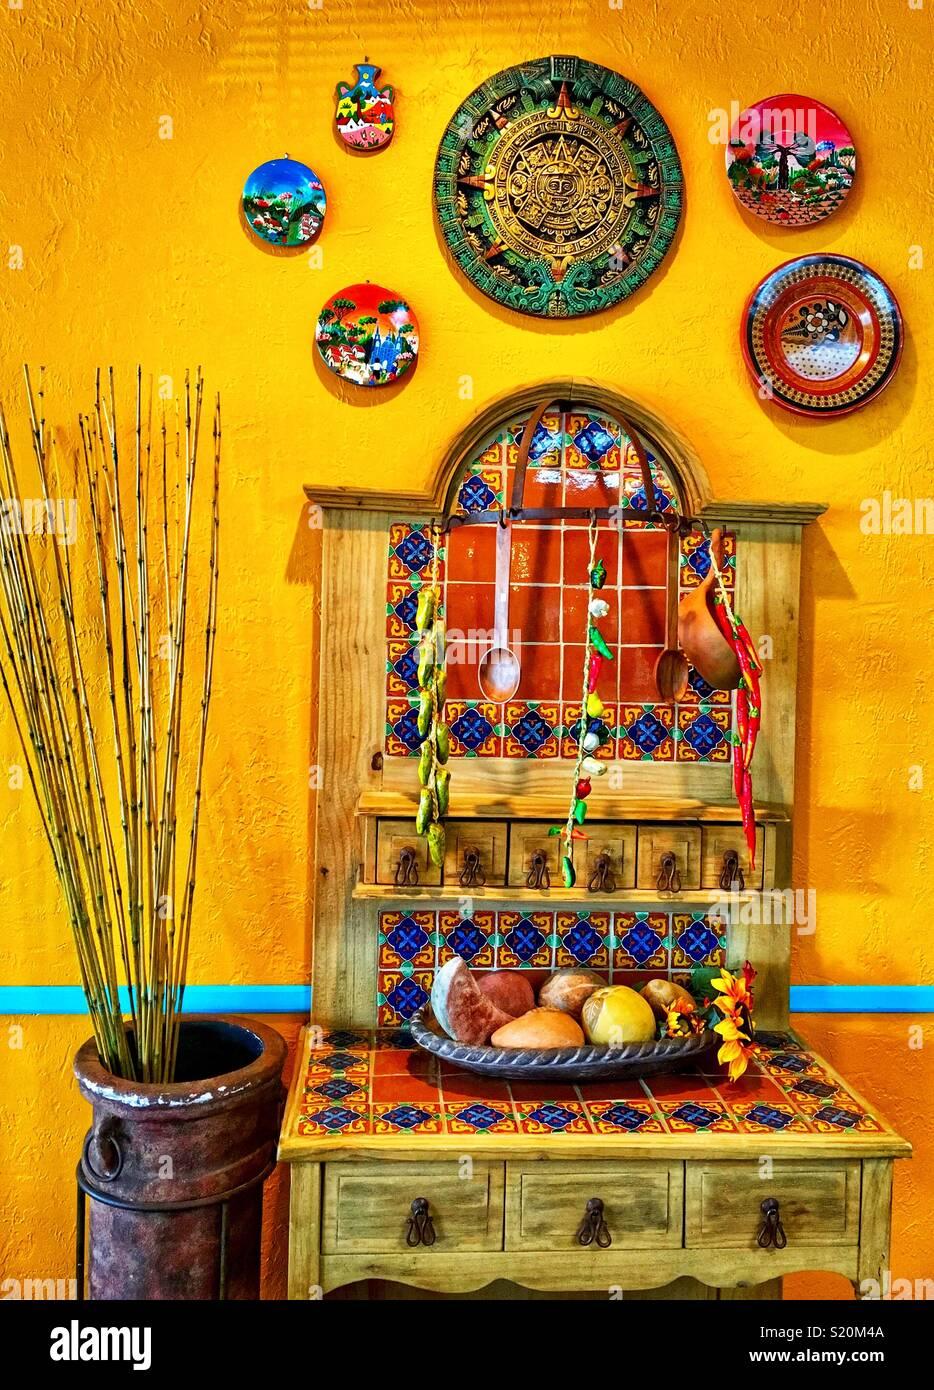 Mexican kitchen decor Stock Photo - Alamy